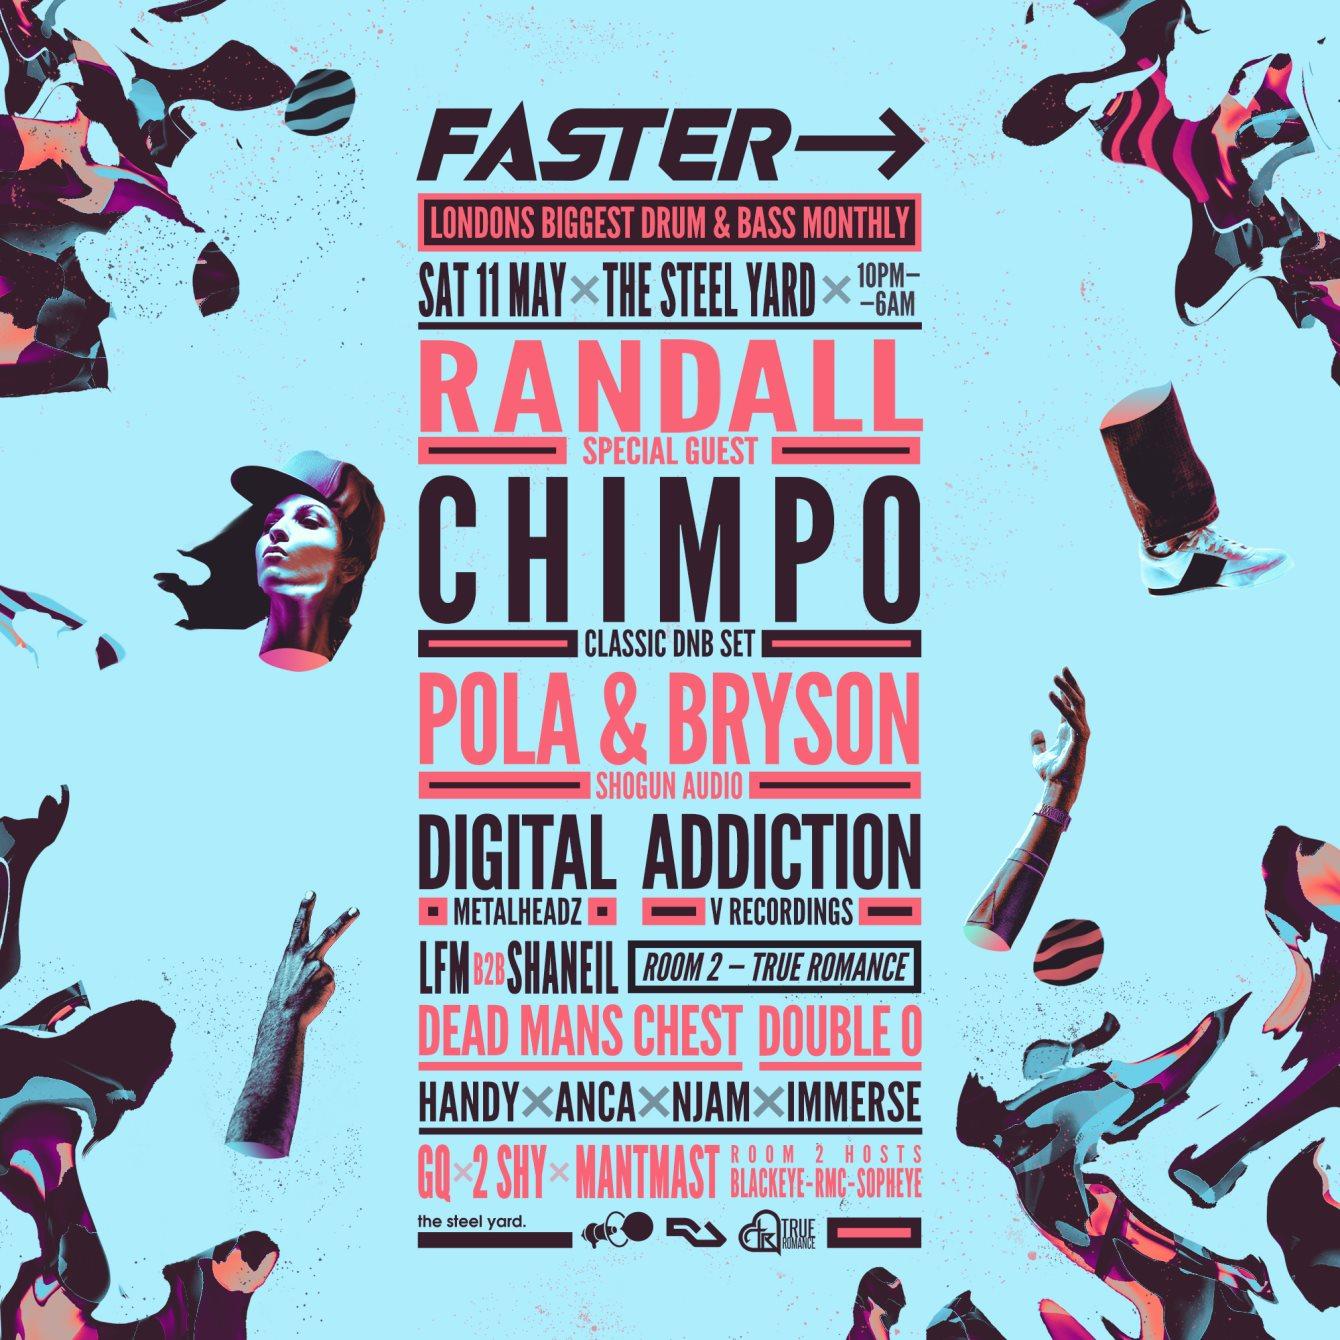 RA: Faster - Randall, Chimpo, Pola & Bryson, Addiction, Digital, MC